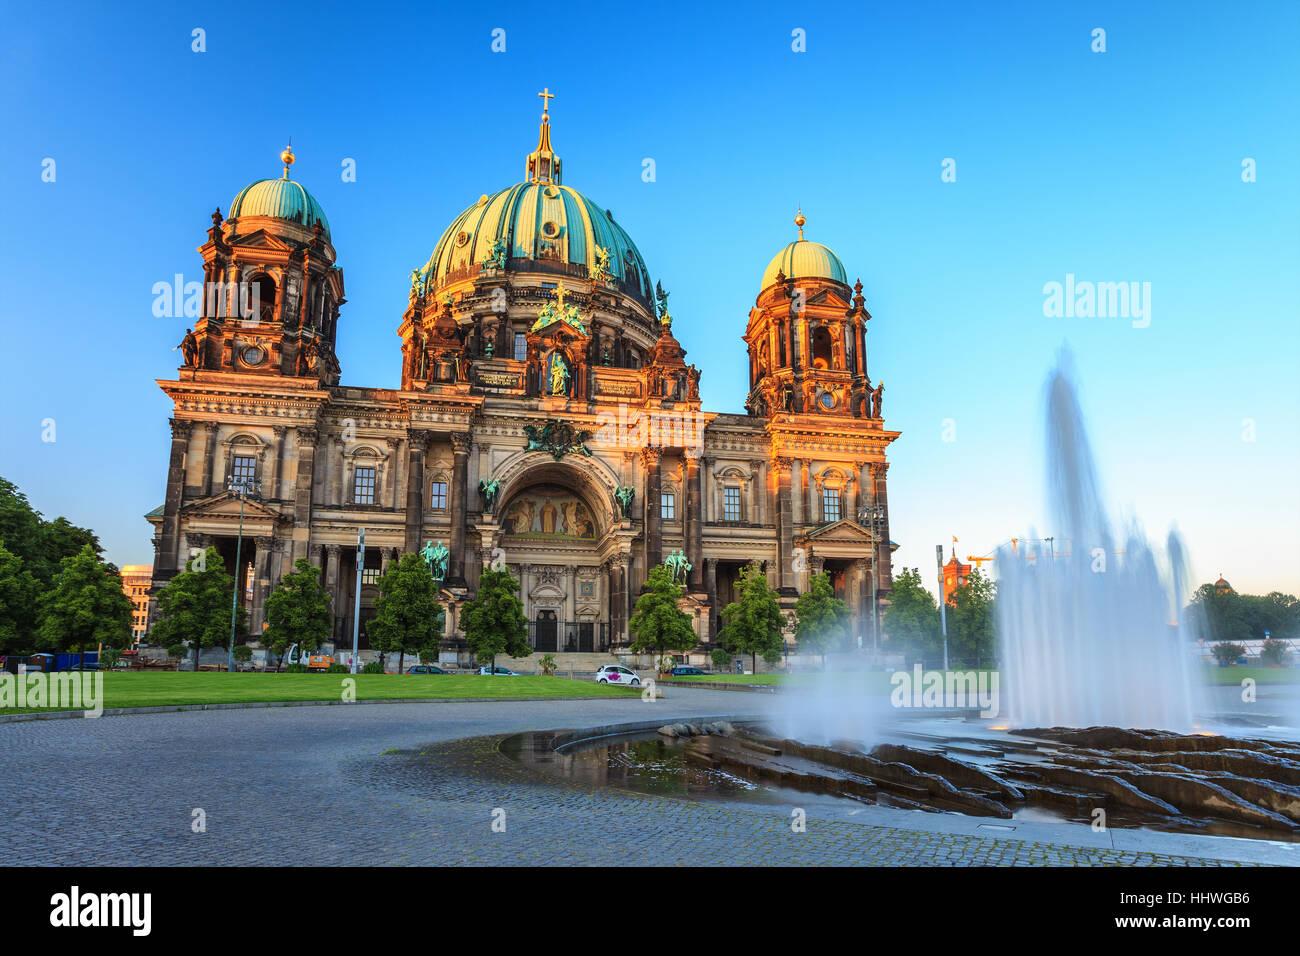 La Catedral de Berlín o Berliner Dom, Berlín, Alemania Imagen De Stock